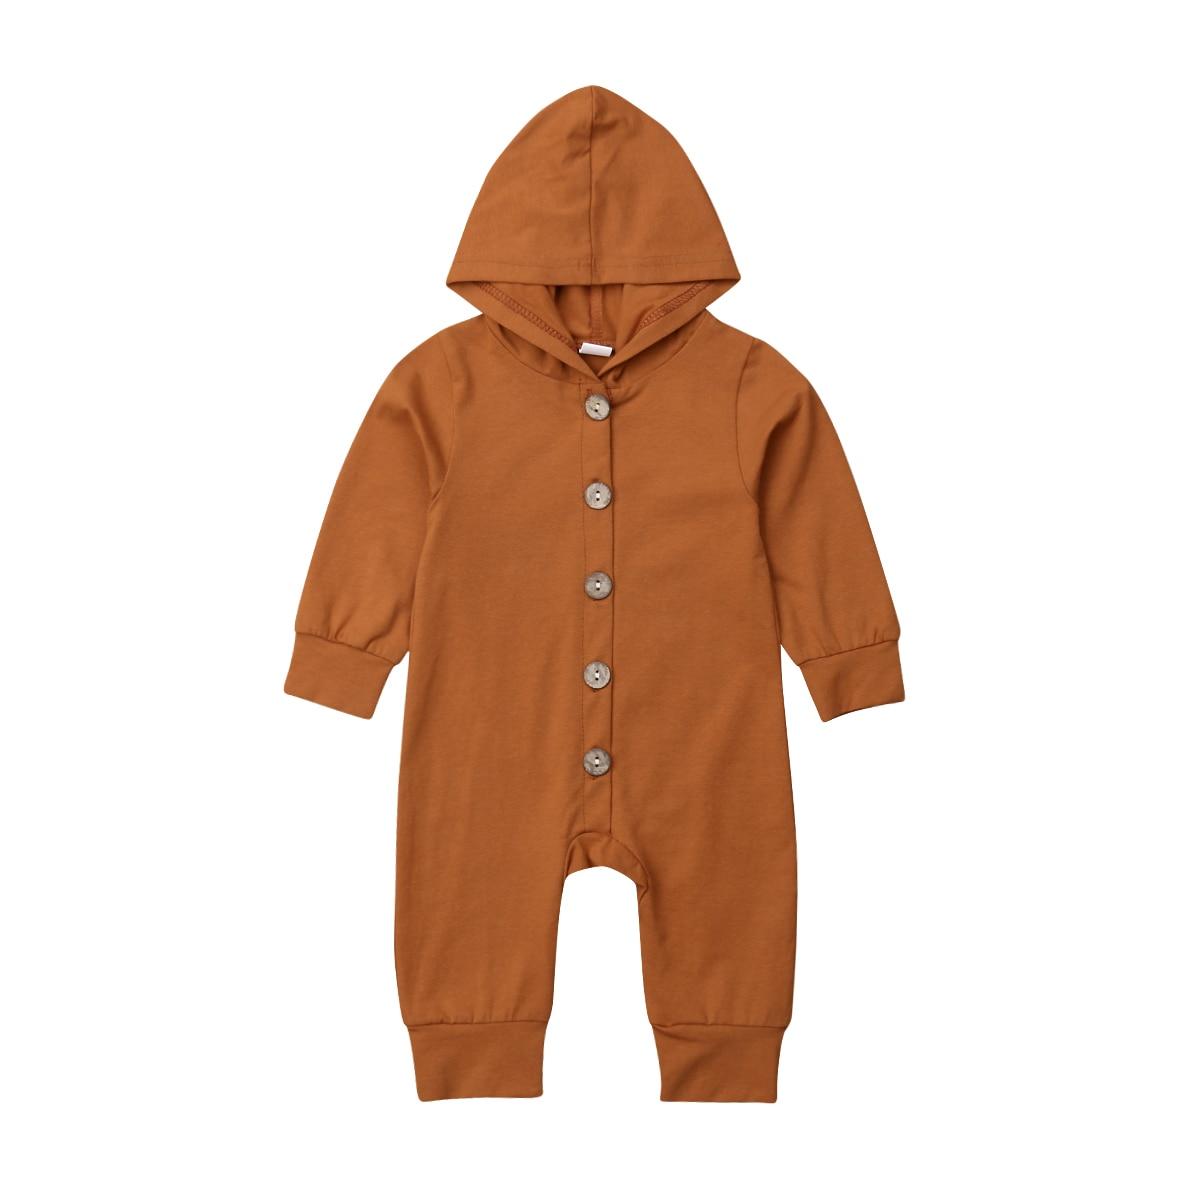 pudcoco Newborn Baby Boy Girl Little Peanut   Romper   clothes 2018 cotton casual   romper   baby boy girl